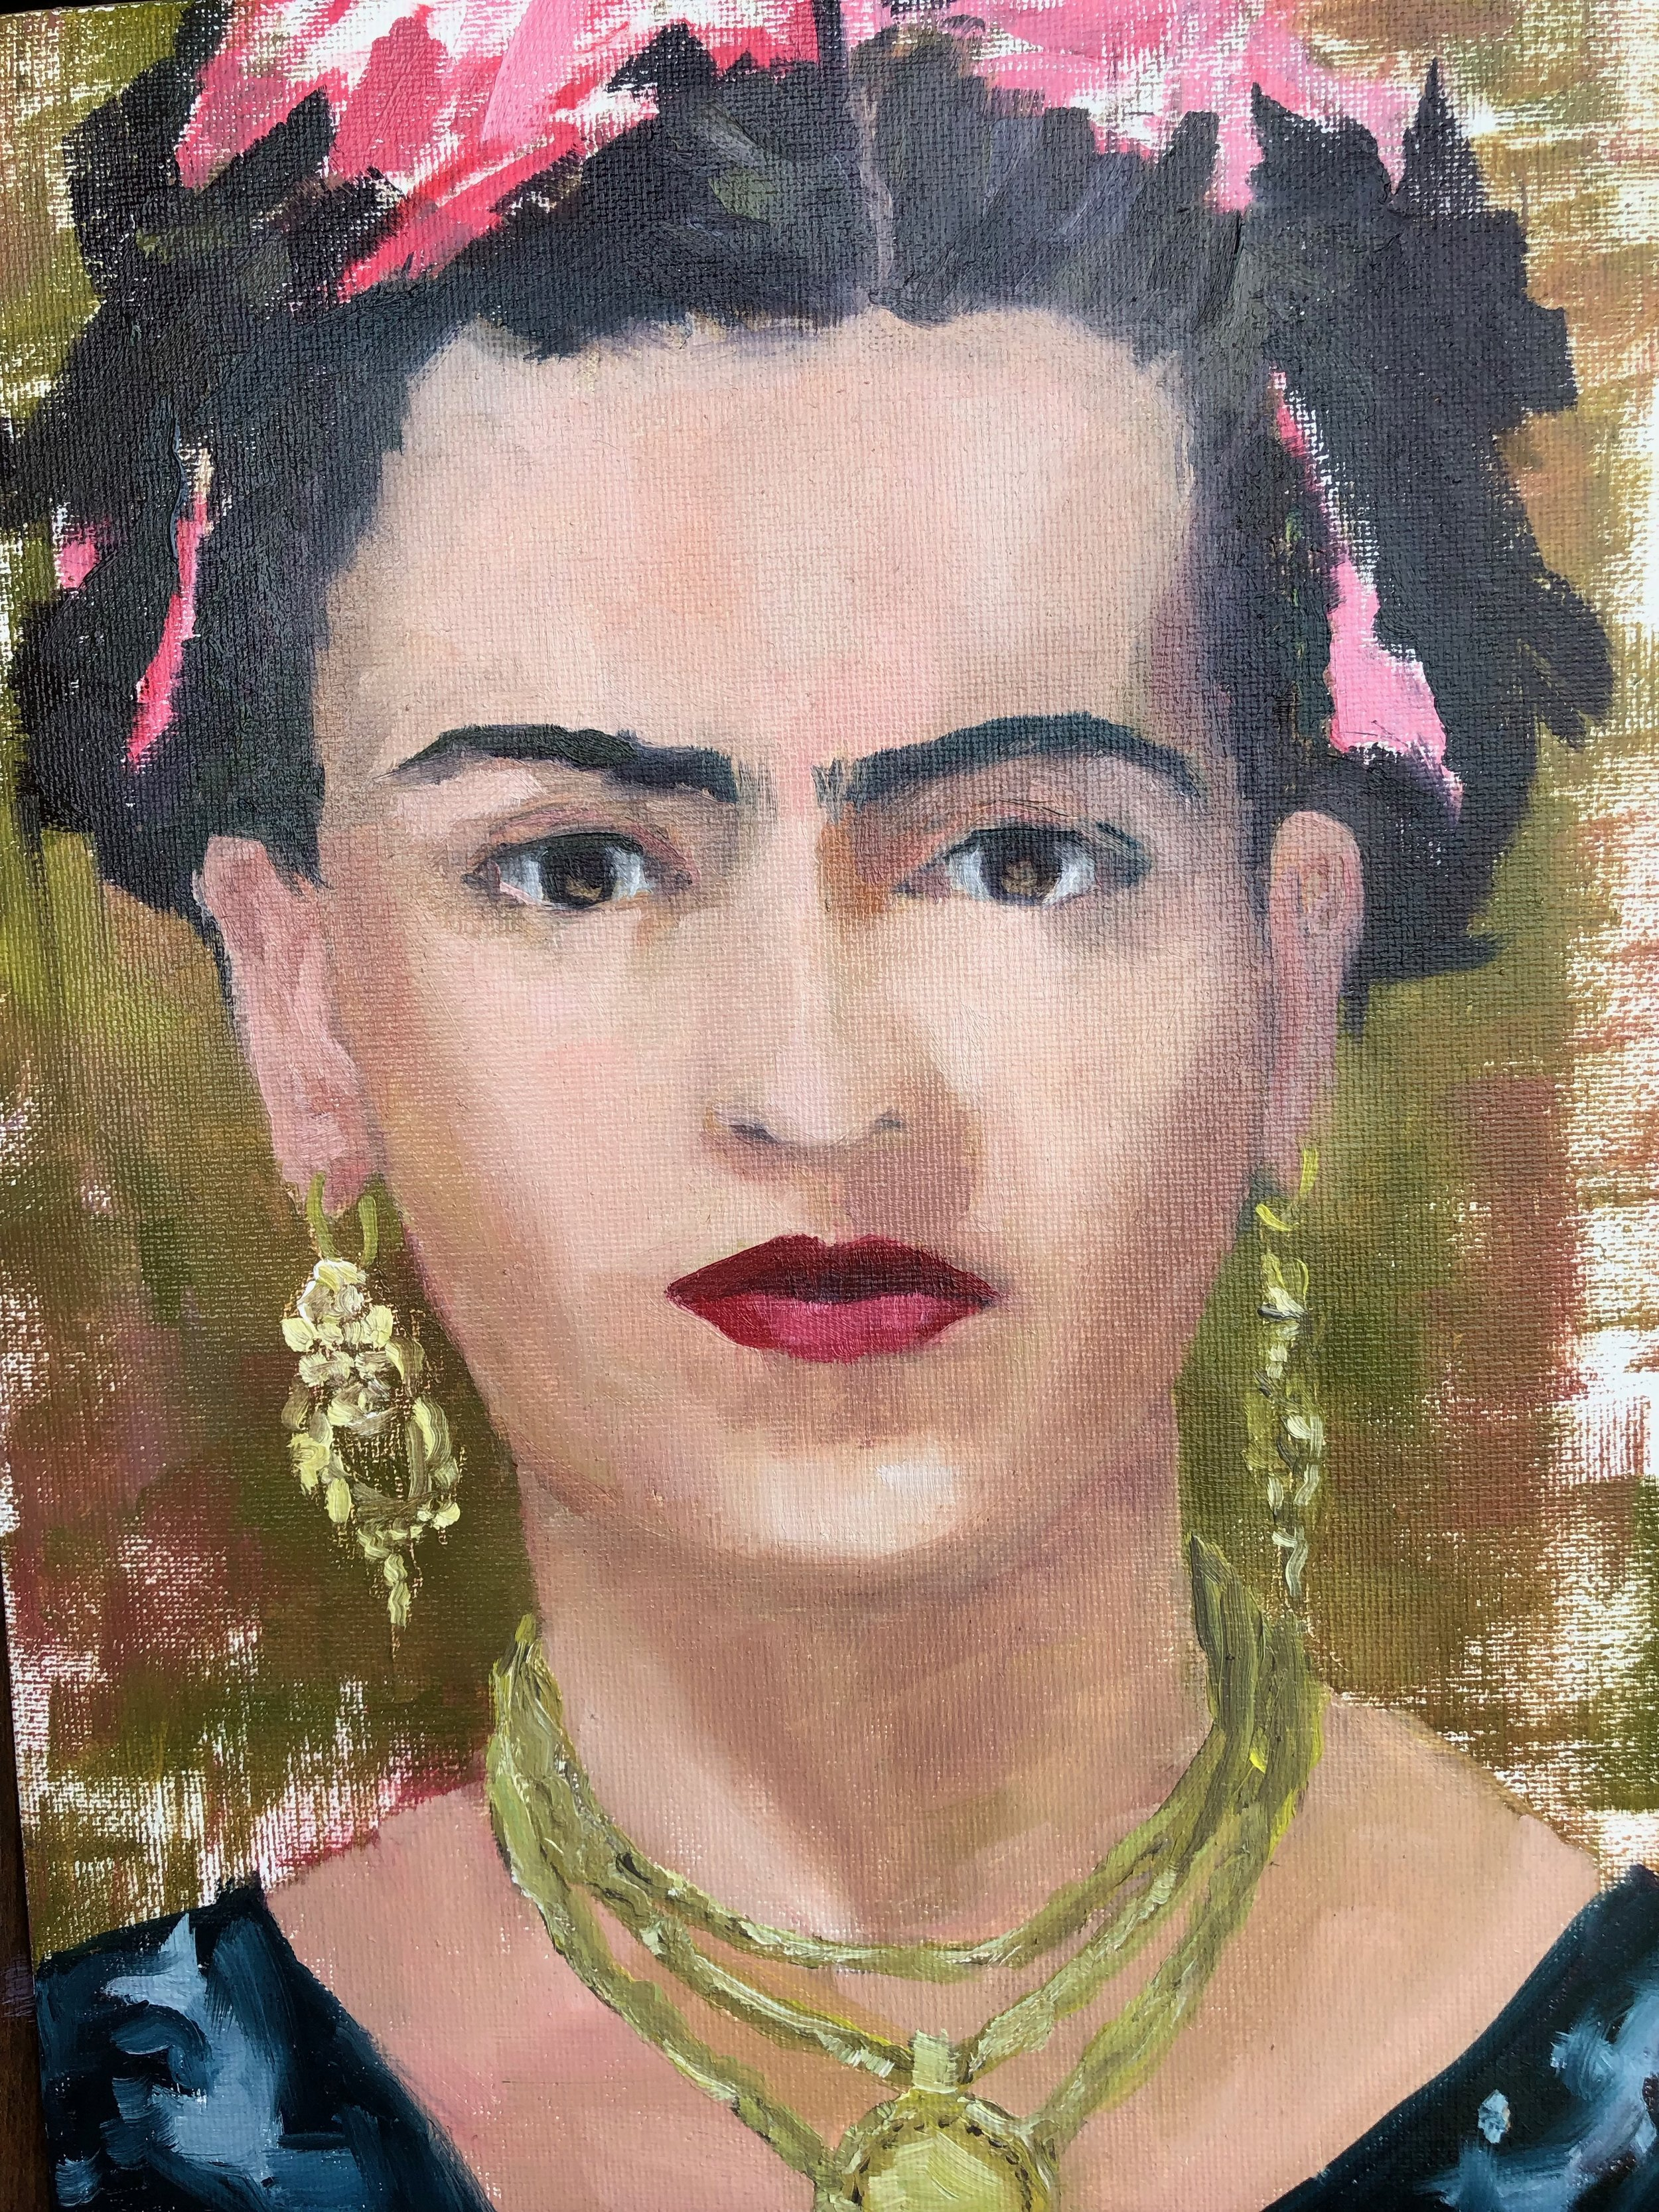 Frida_Kahlo_oil_painting_canvas.jpeg